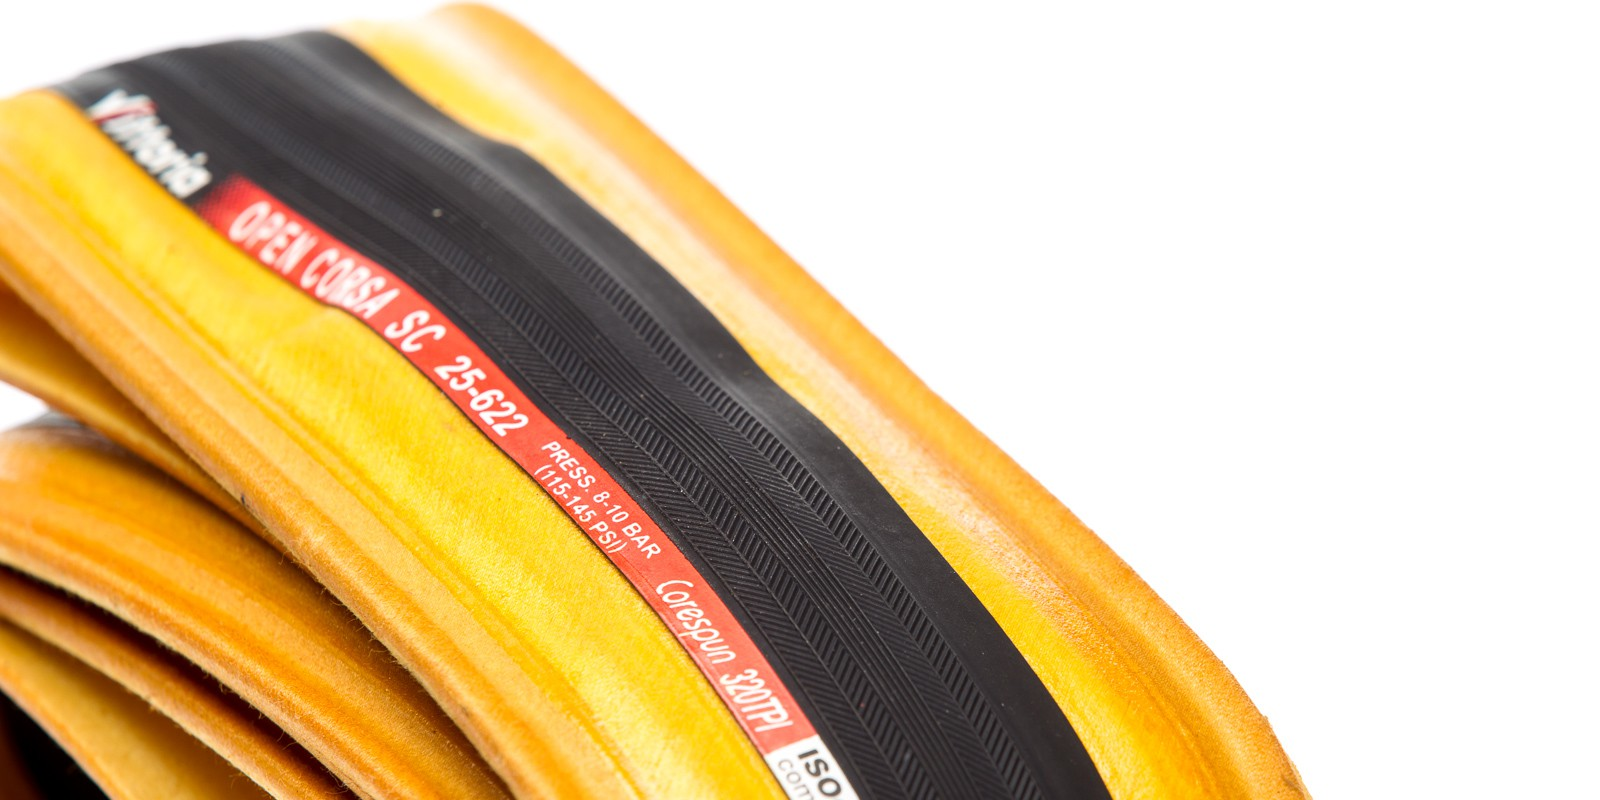 Vittoria Open Corsa SC II 25c Tire